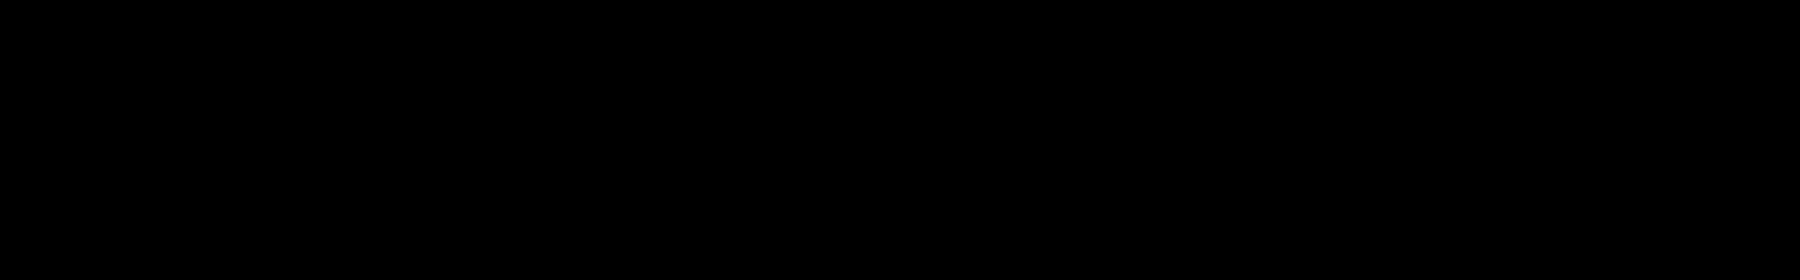 Dark Ambience audio waveform